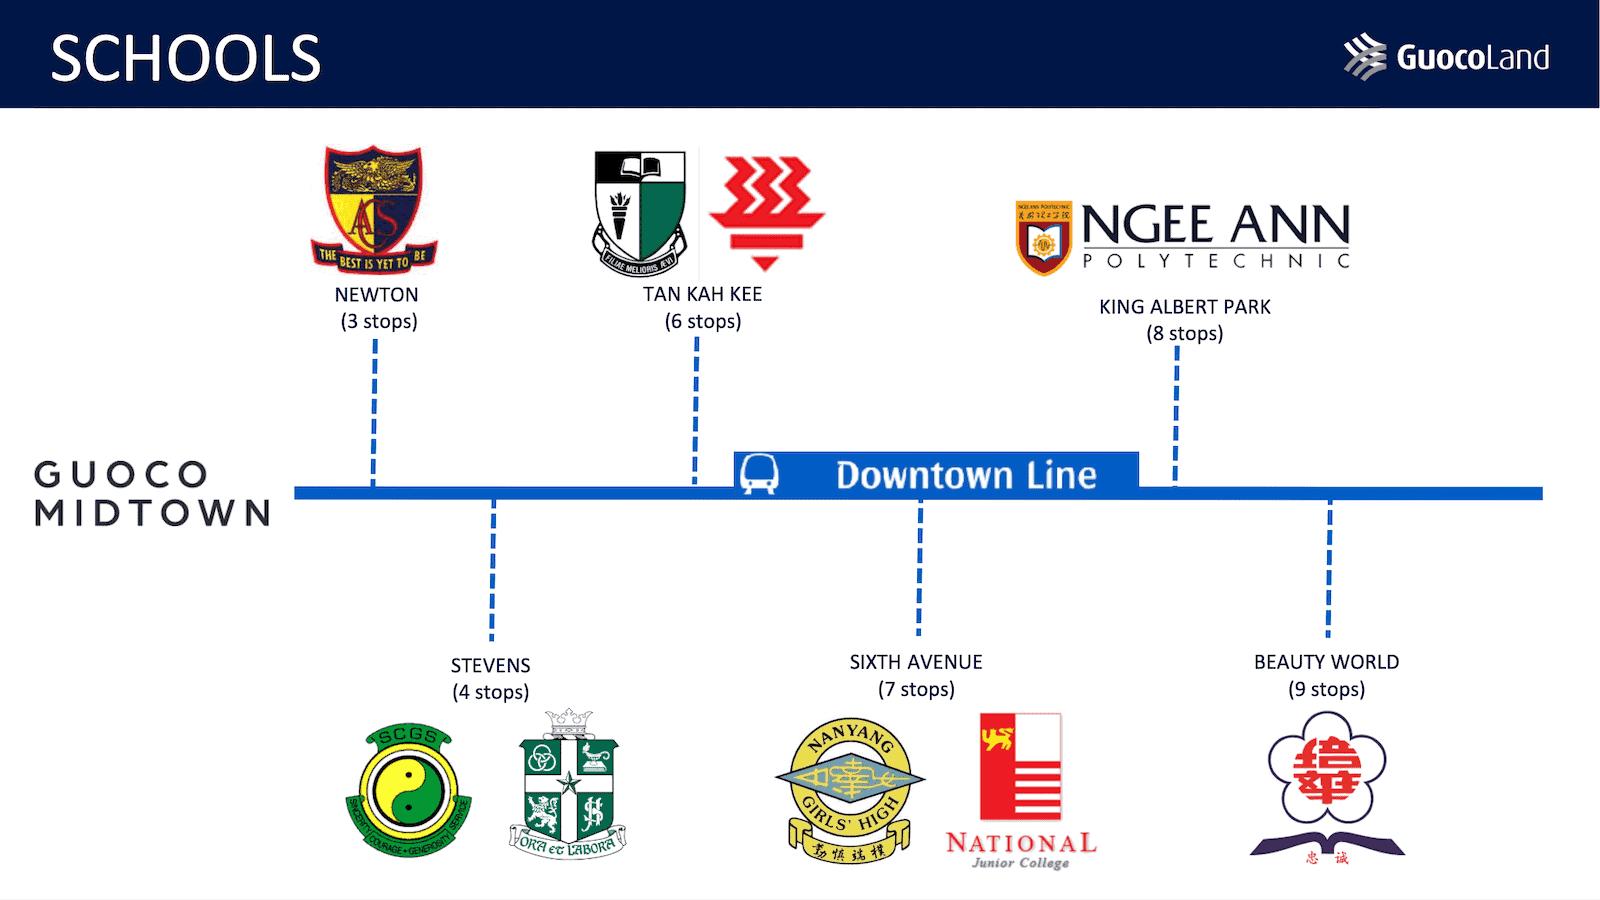 Midtown Modern Location Schools